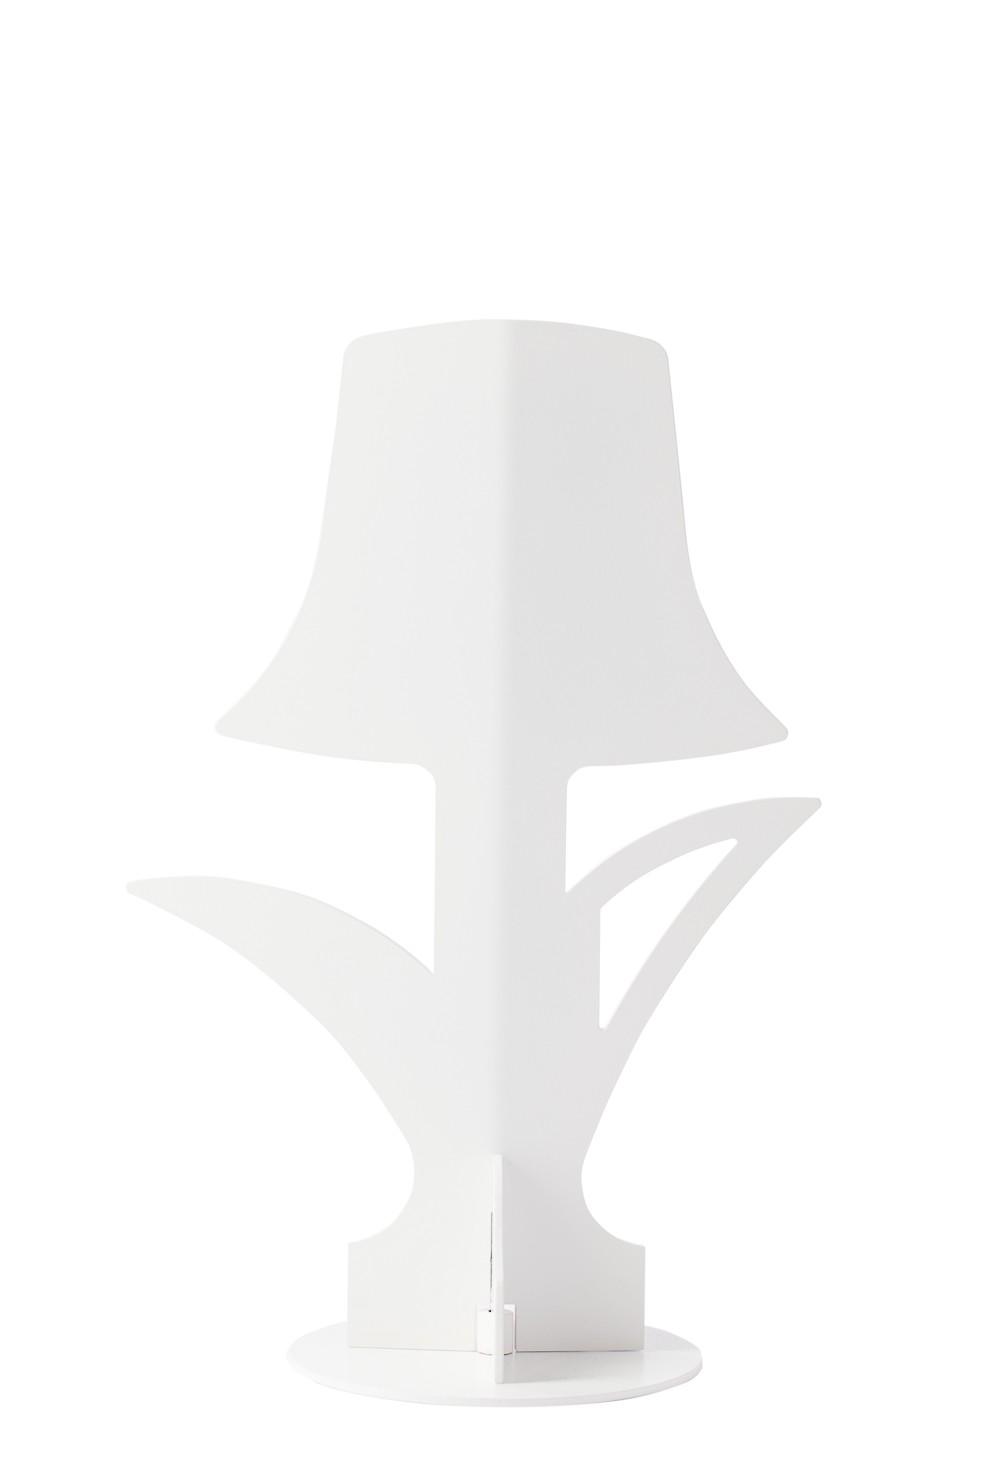 Lampada Lampada da tavolo \u0100hua Bloom Bianca - Lampada a Led da Tavolo Bianca